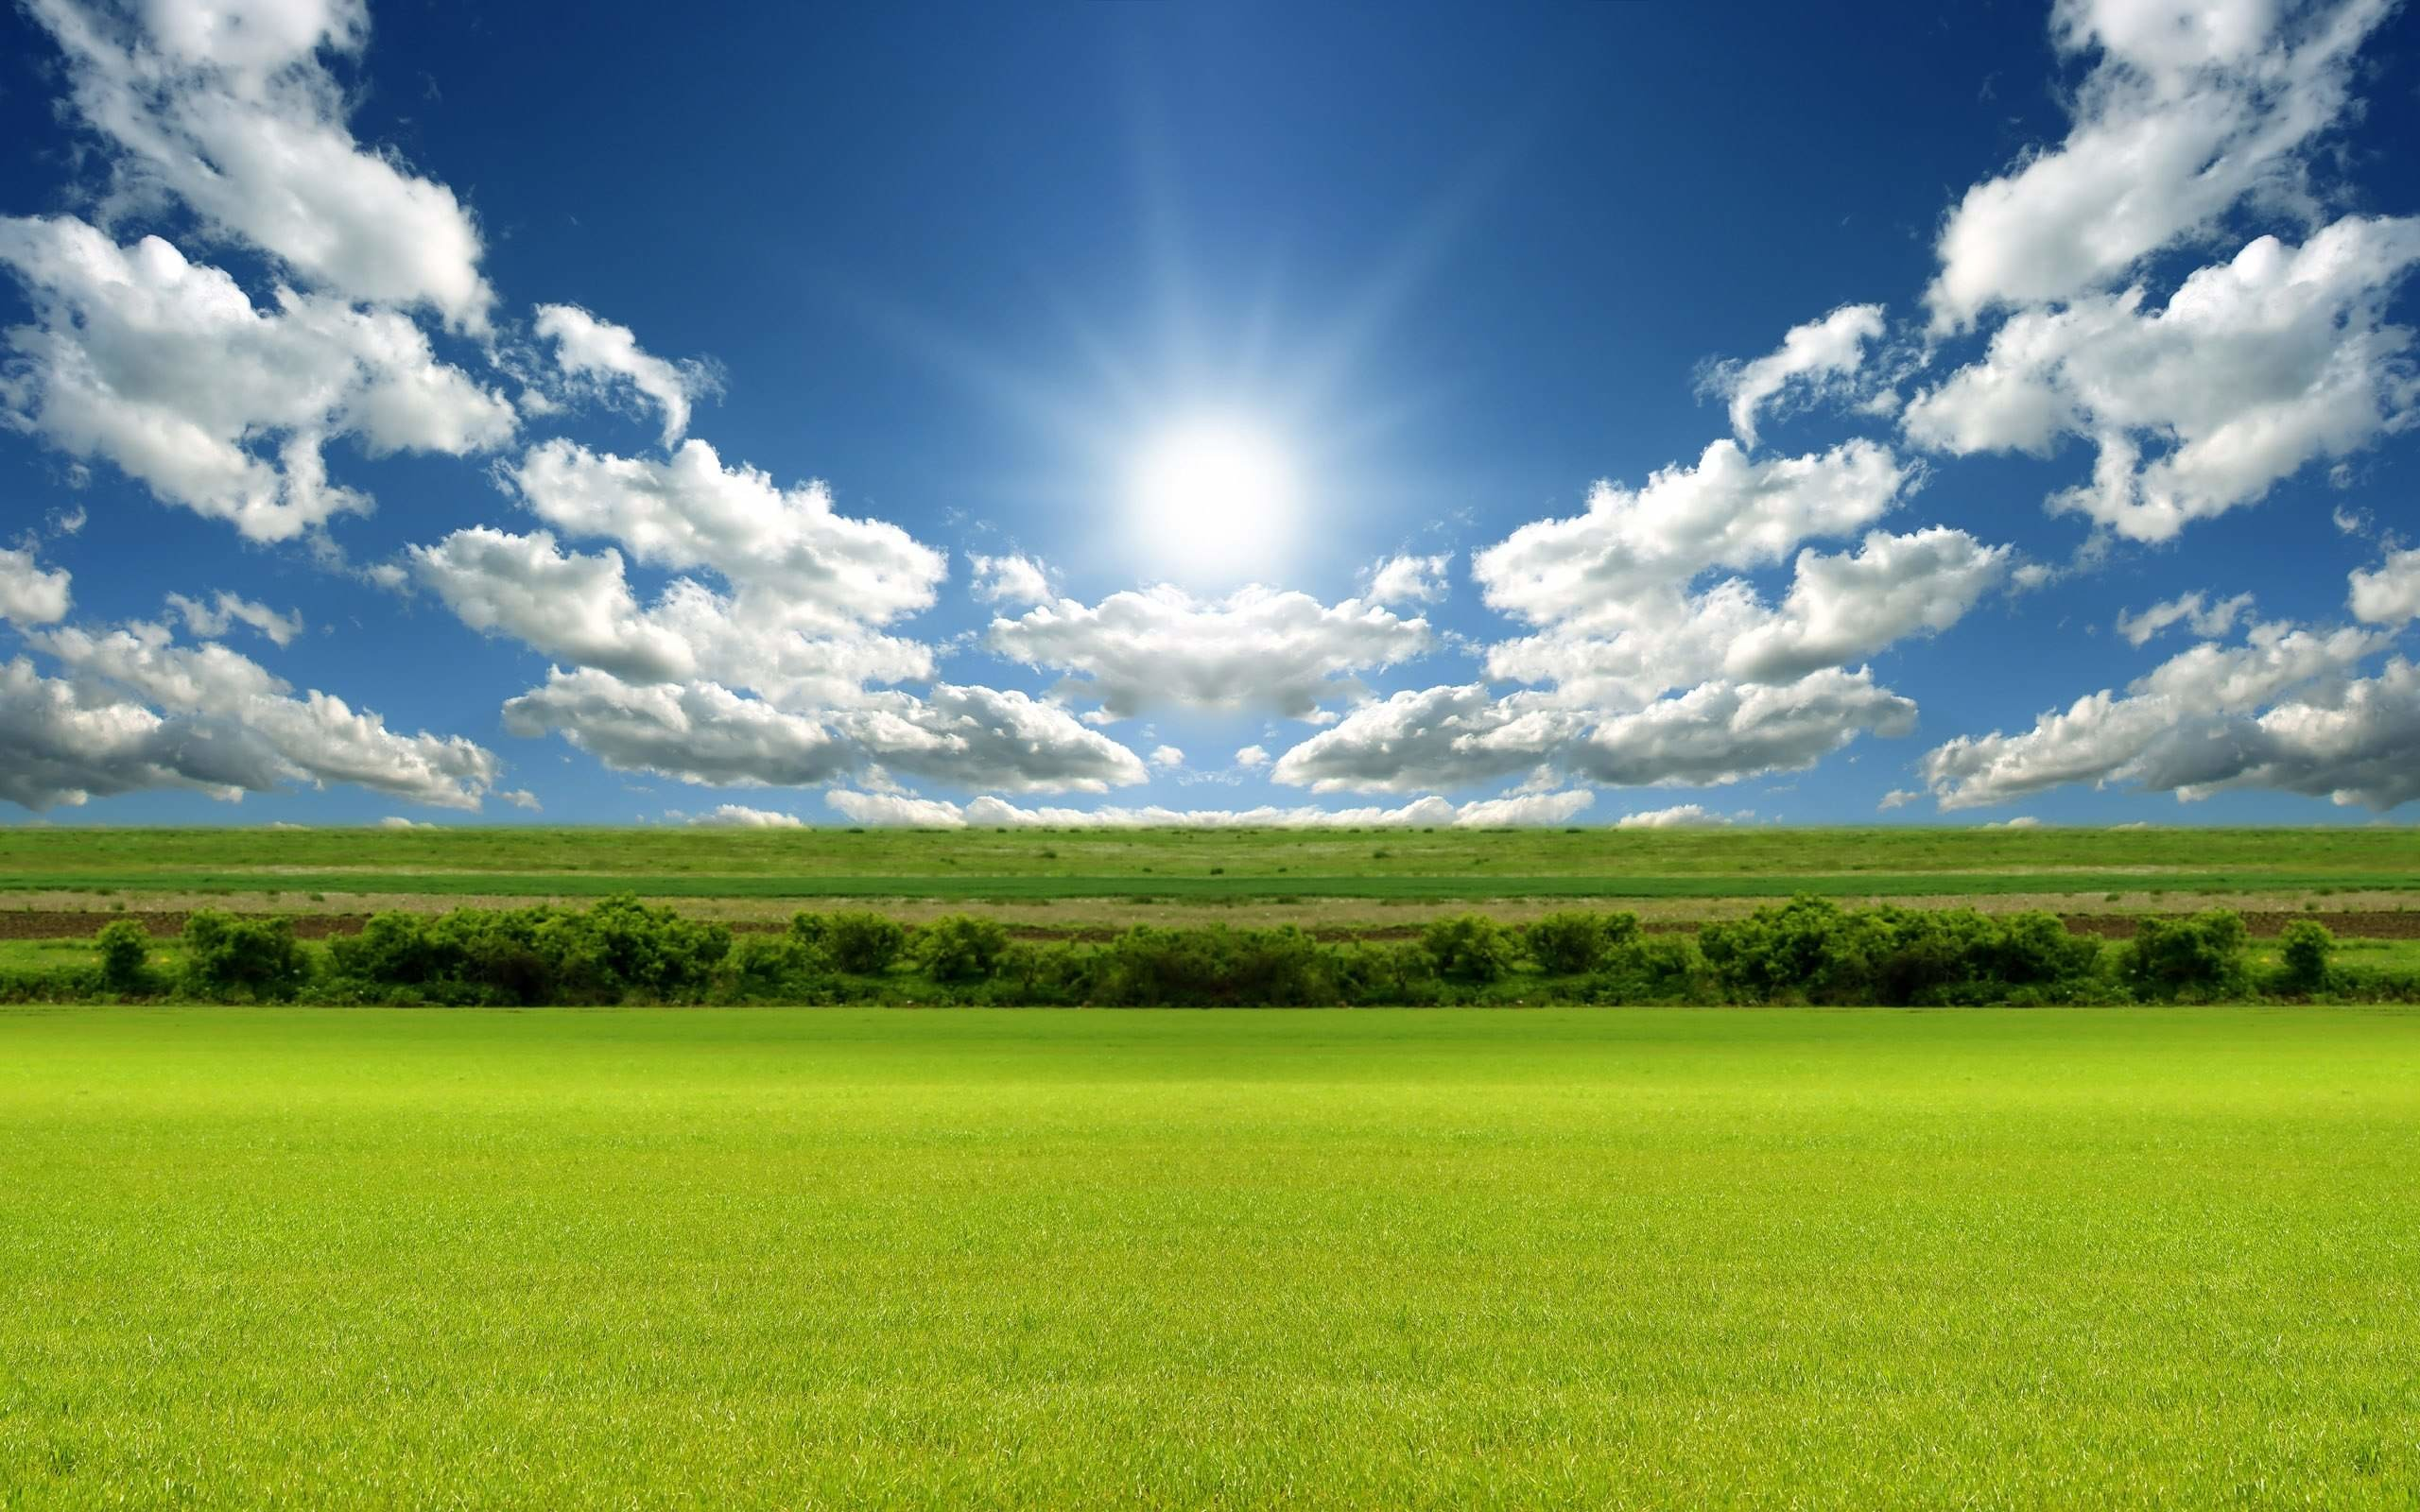 Spring Wallpaper HD – High Definition Wallpaper. Sunshine Nature Wallpaper  High Resolution